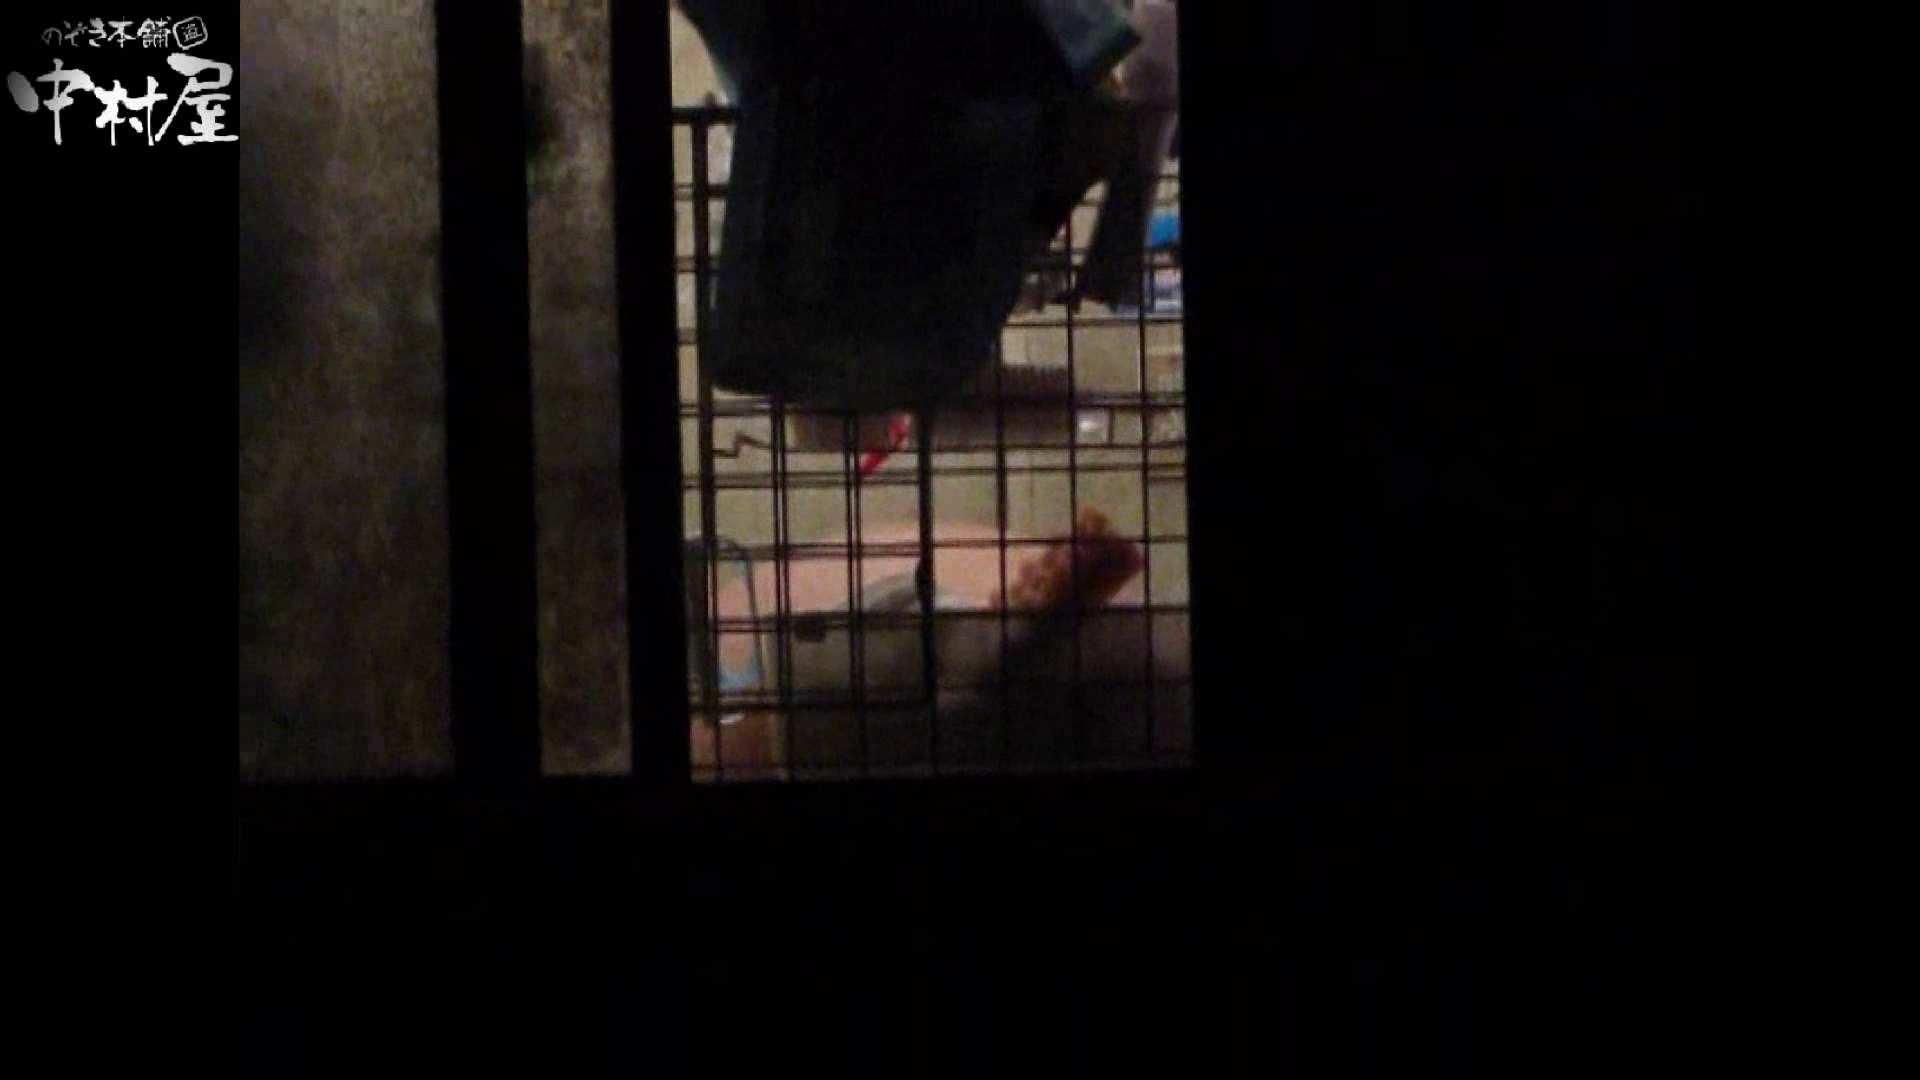 民家風呂専門盗撮師の超危険映像 vol.023 OLのエロ生活 性交動画流出 95連発 80